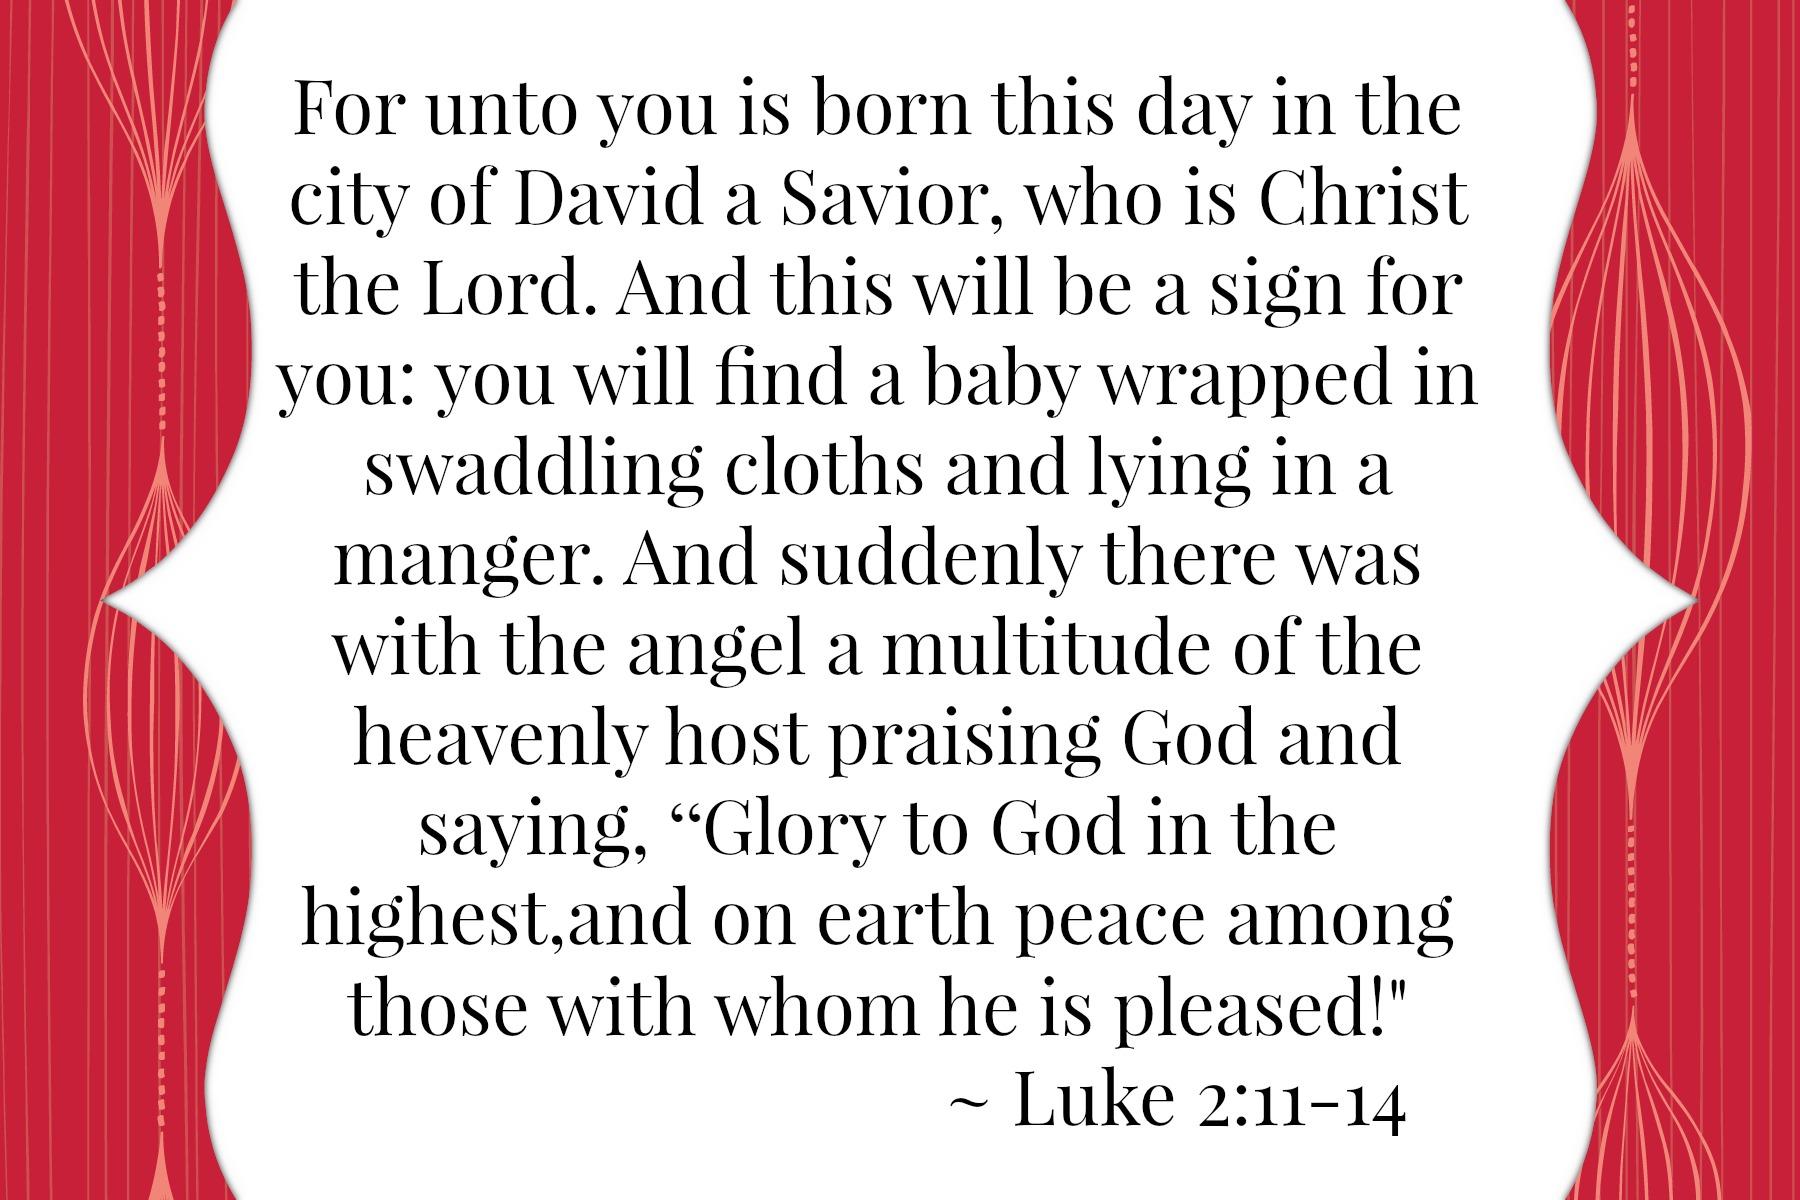 Luke 2:11-14 {Bible to Brain to Heart Scripture Memory Challenge}